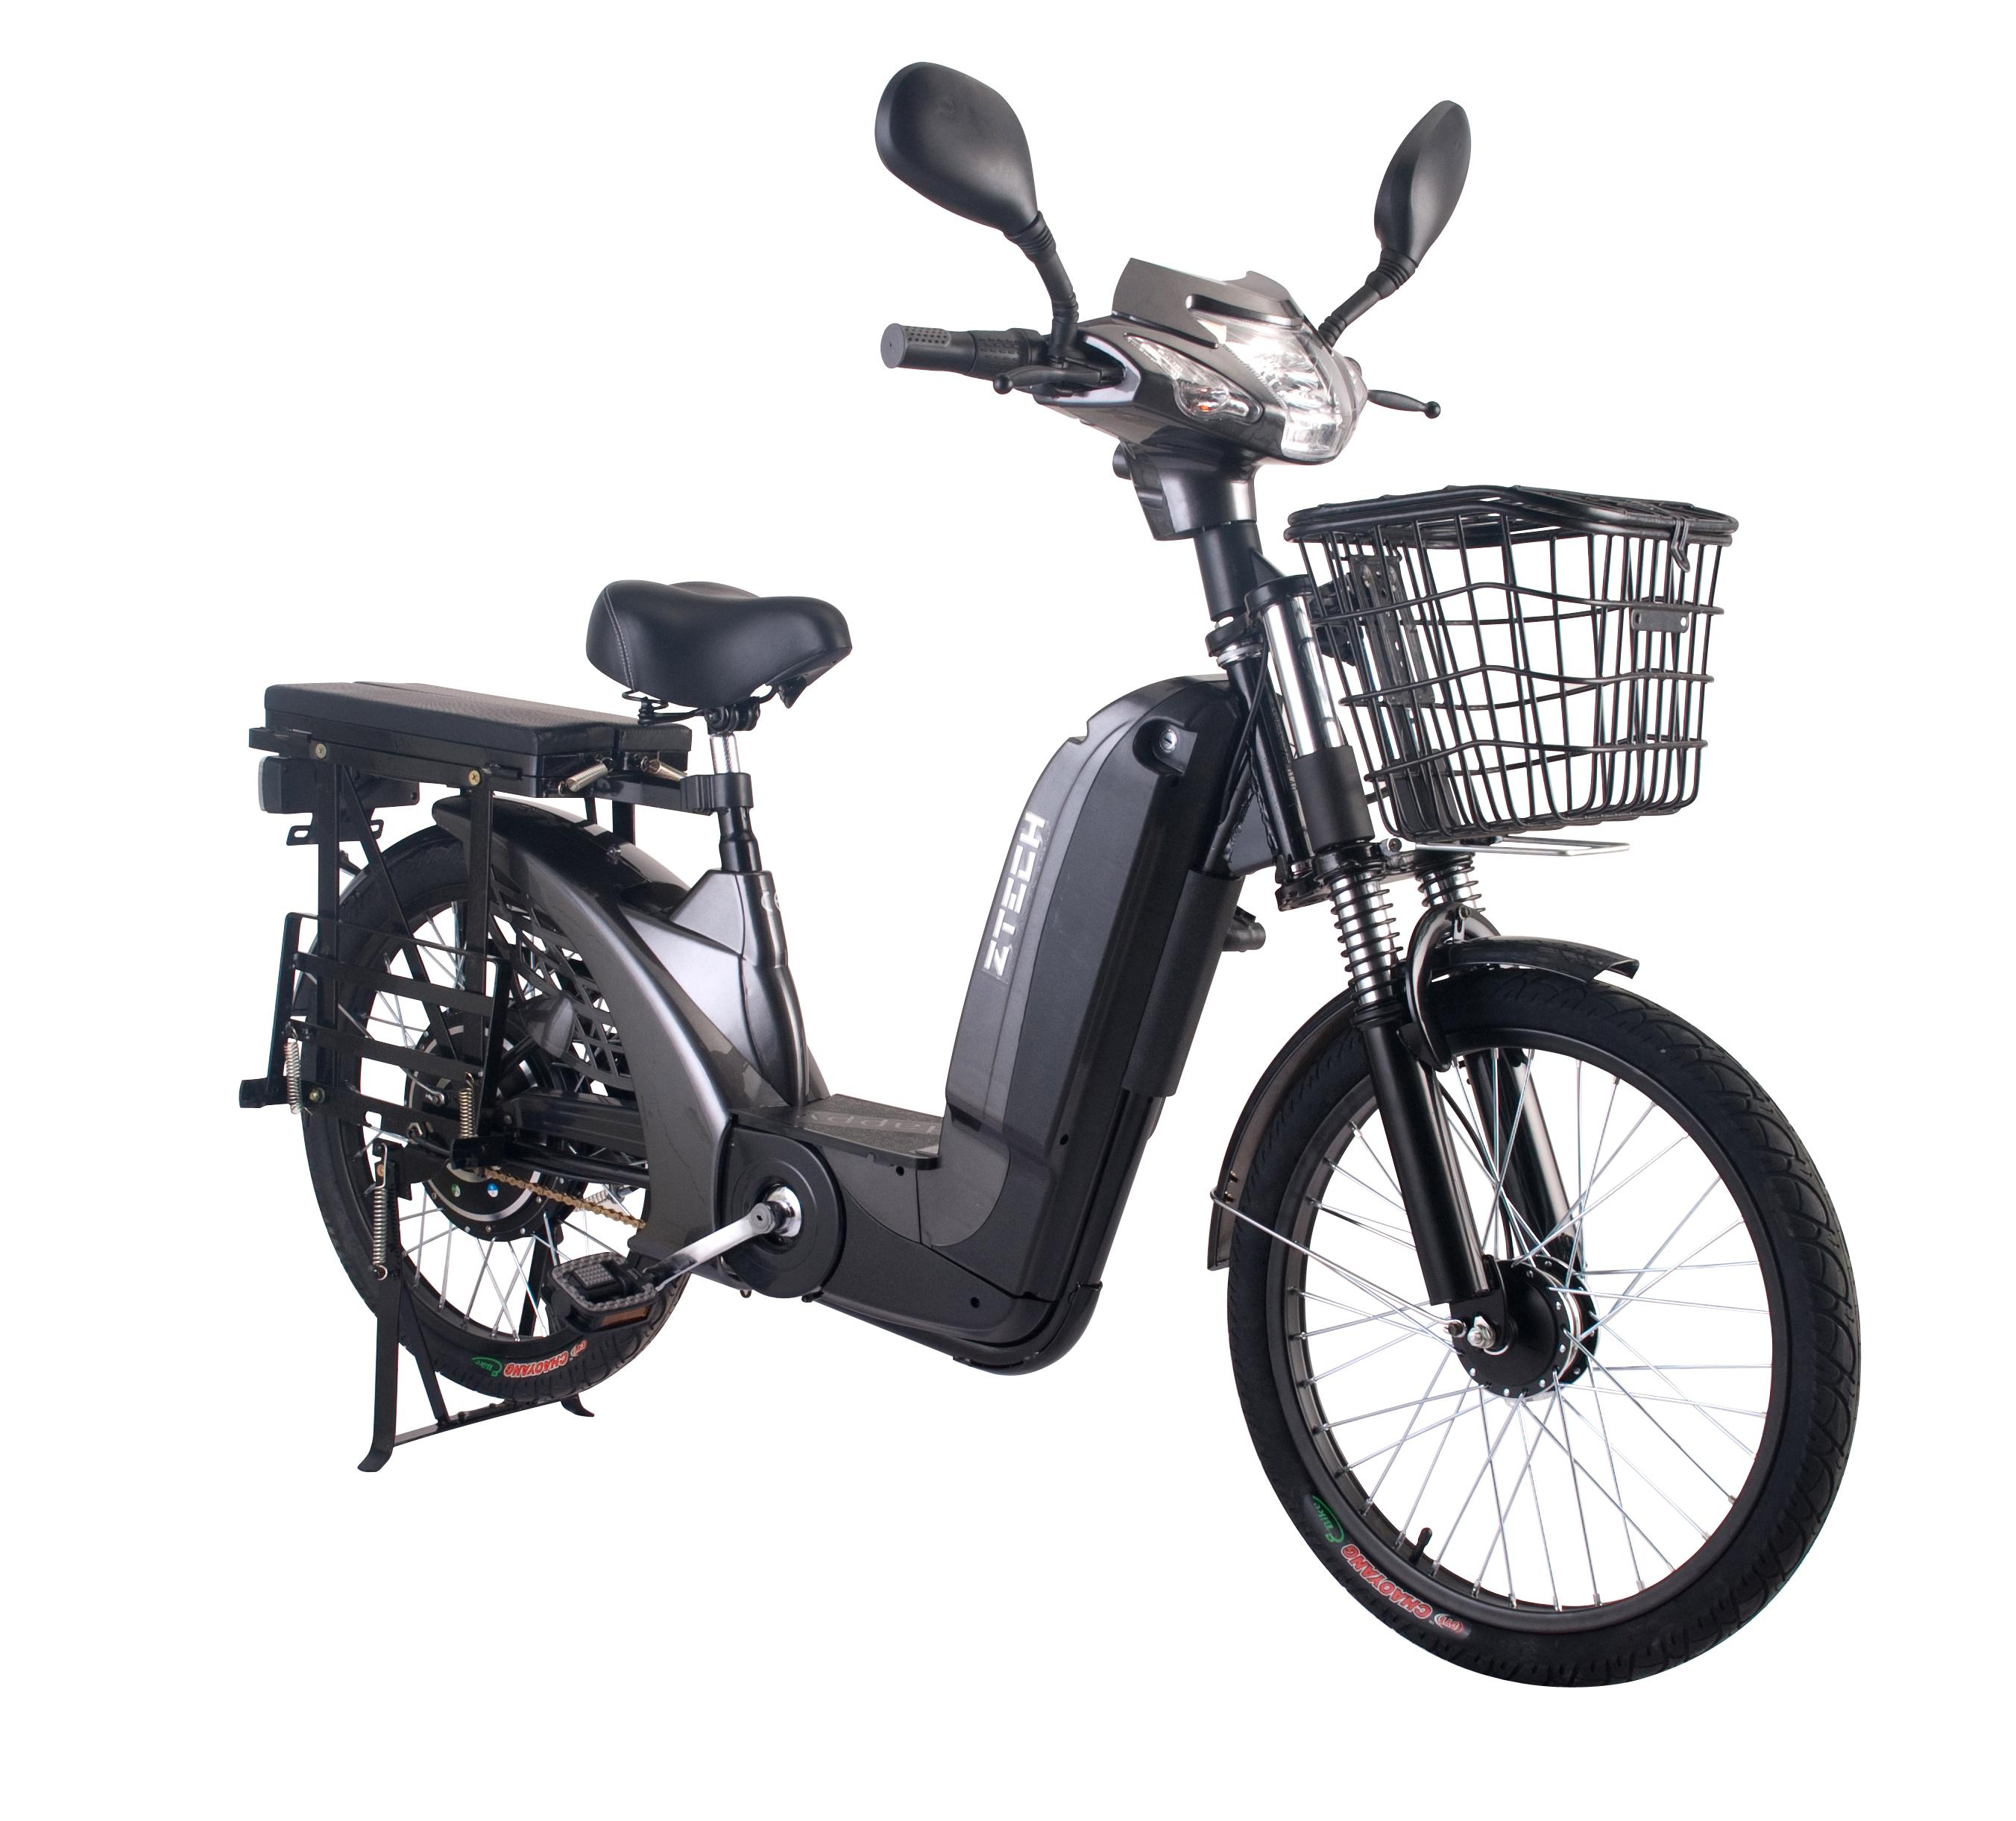 Bicicleta electrica Ztech Laser 2.0 ZT-10